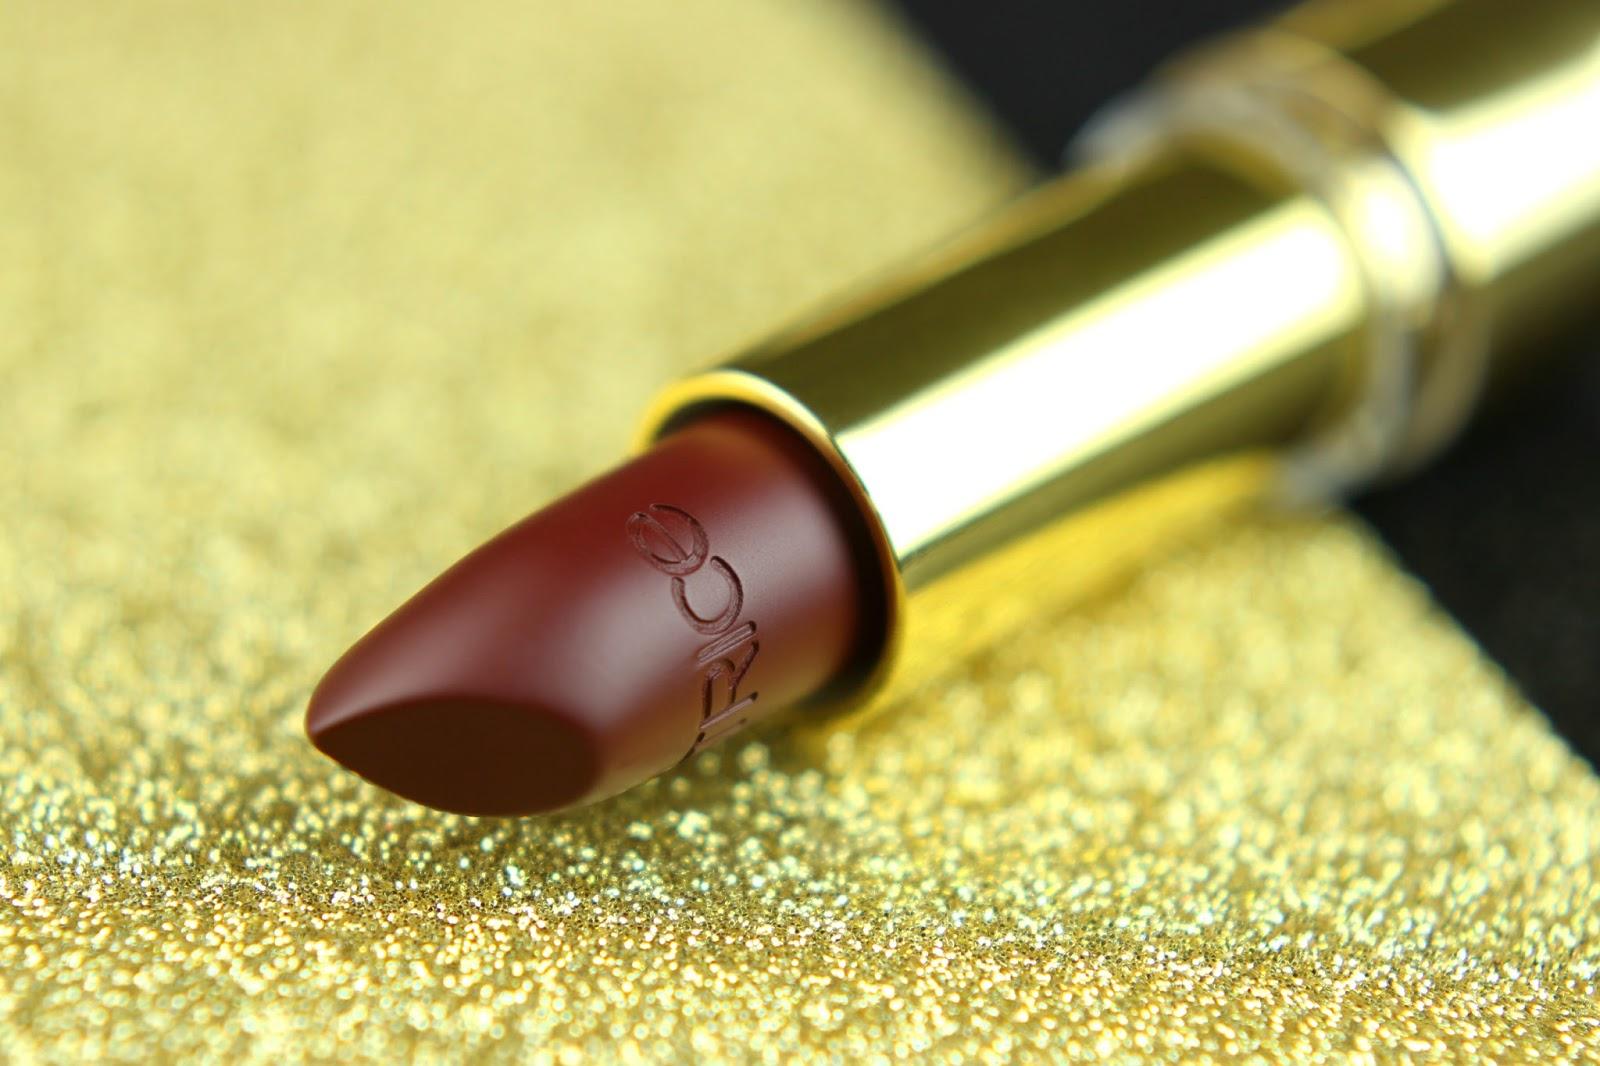 beauty meets fashion, CATRICE, drogerie, fashion, highlighter, kaviar gauche, lidschatten, limited edition, lippenstift, look, nagellack, nude, nude sublime, palette, review, rouge noir, swatches, tragebilder,